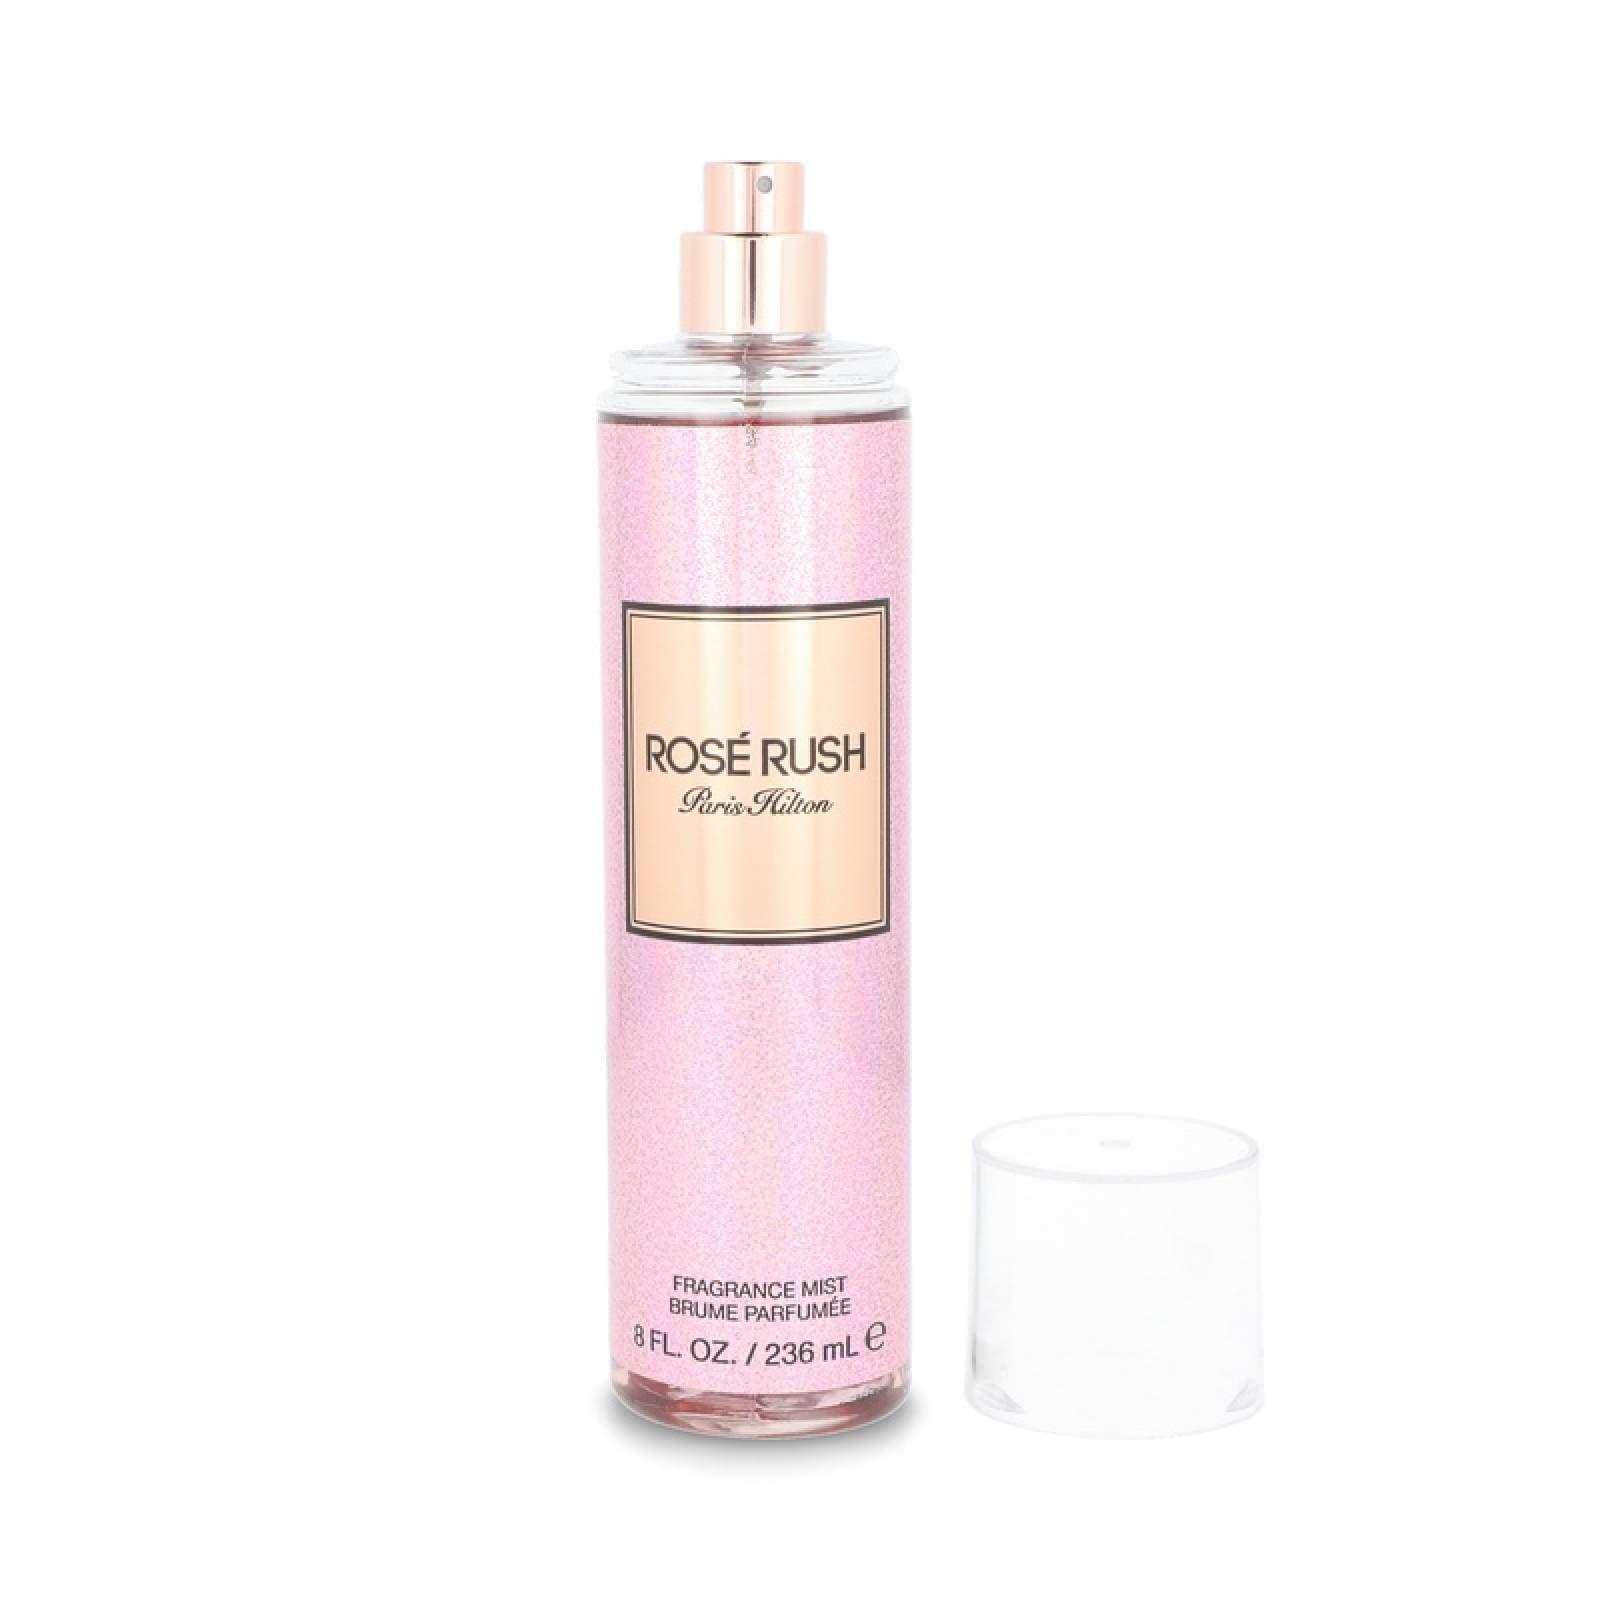 Perfume para Dama Rose Rush 236 ml Body Mist de Paris Hilton